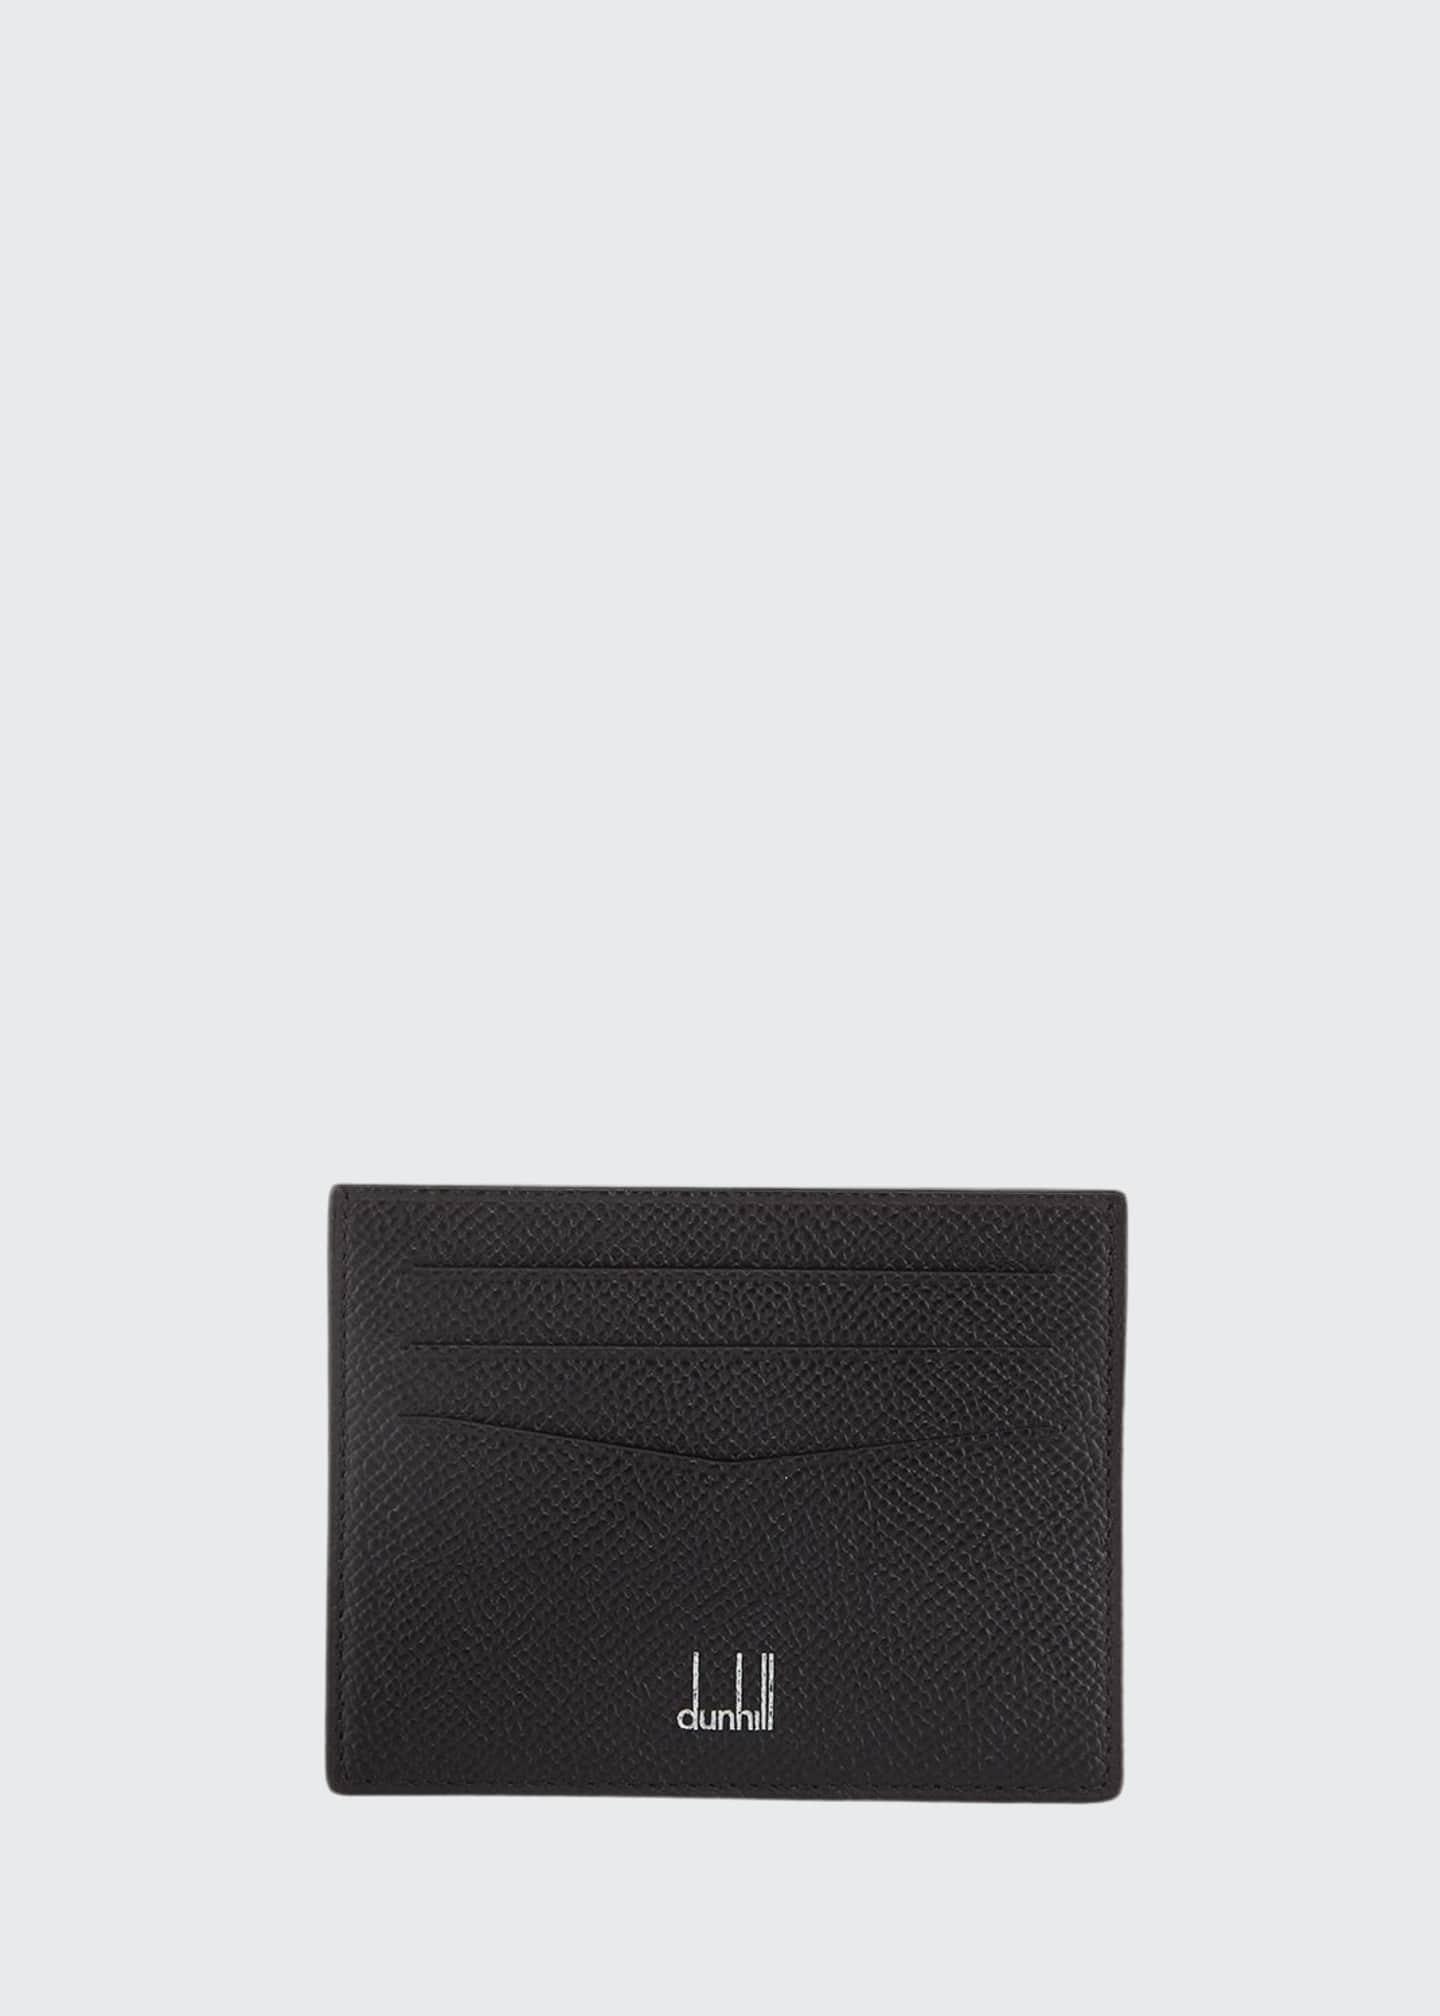 dunhill Men's Cadogan Leather Card Case